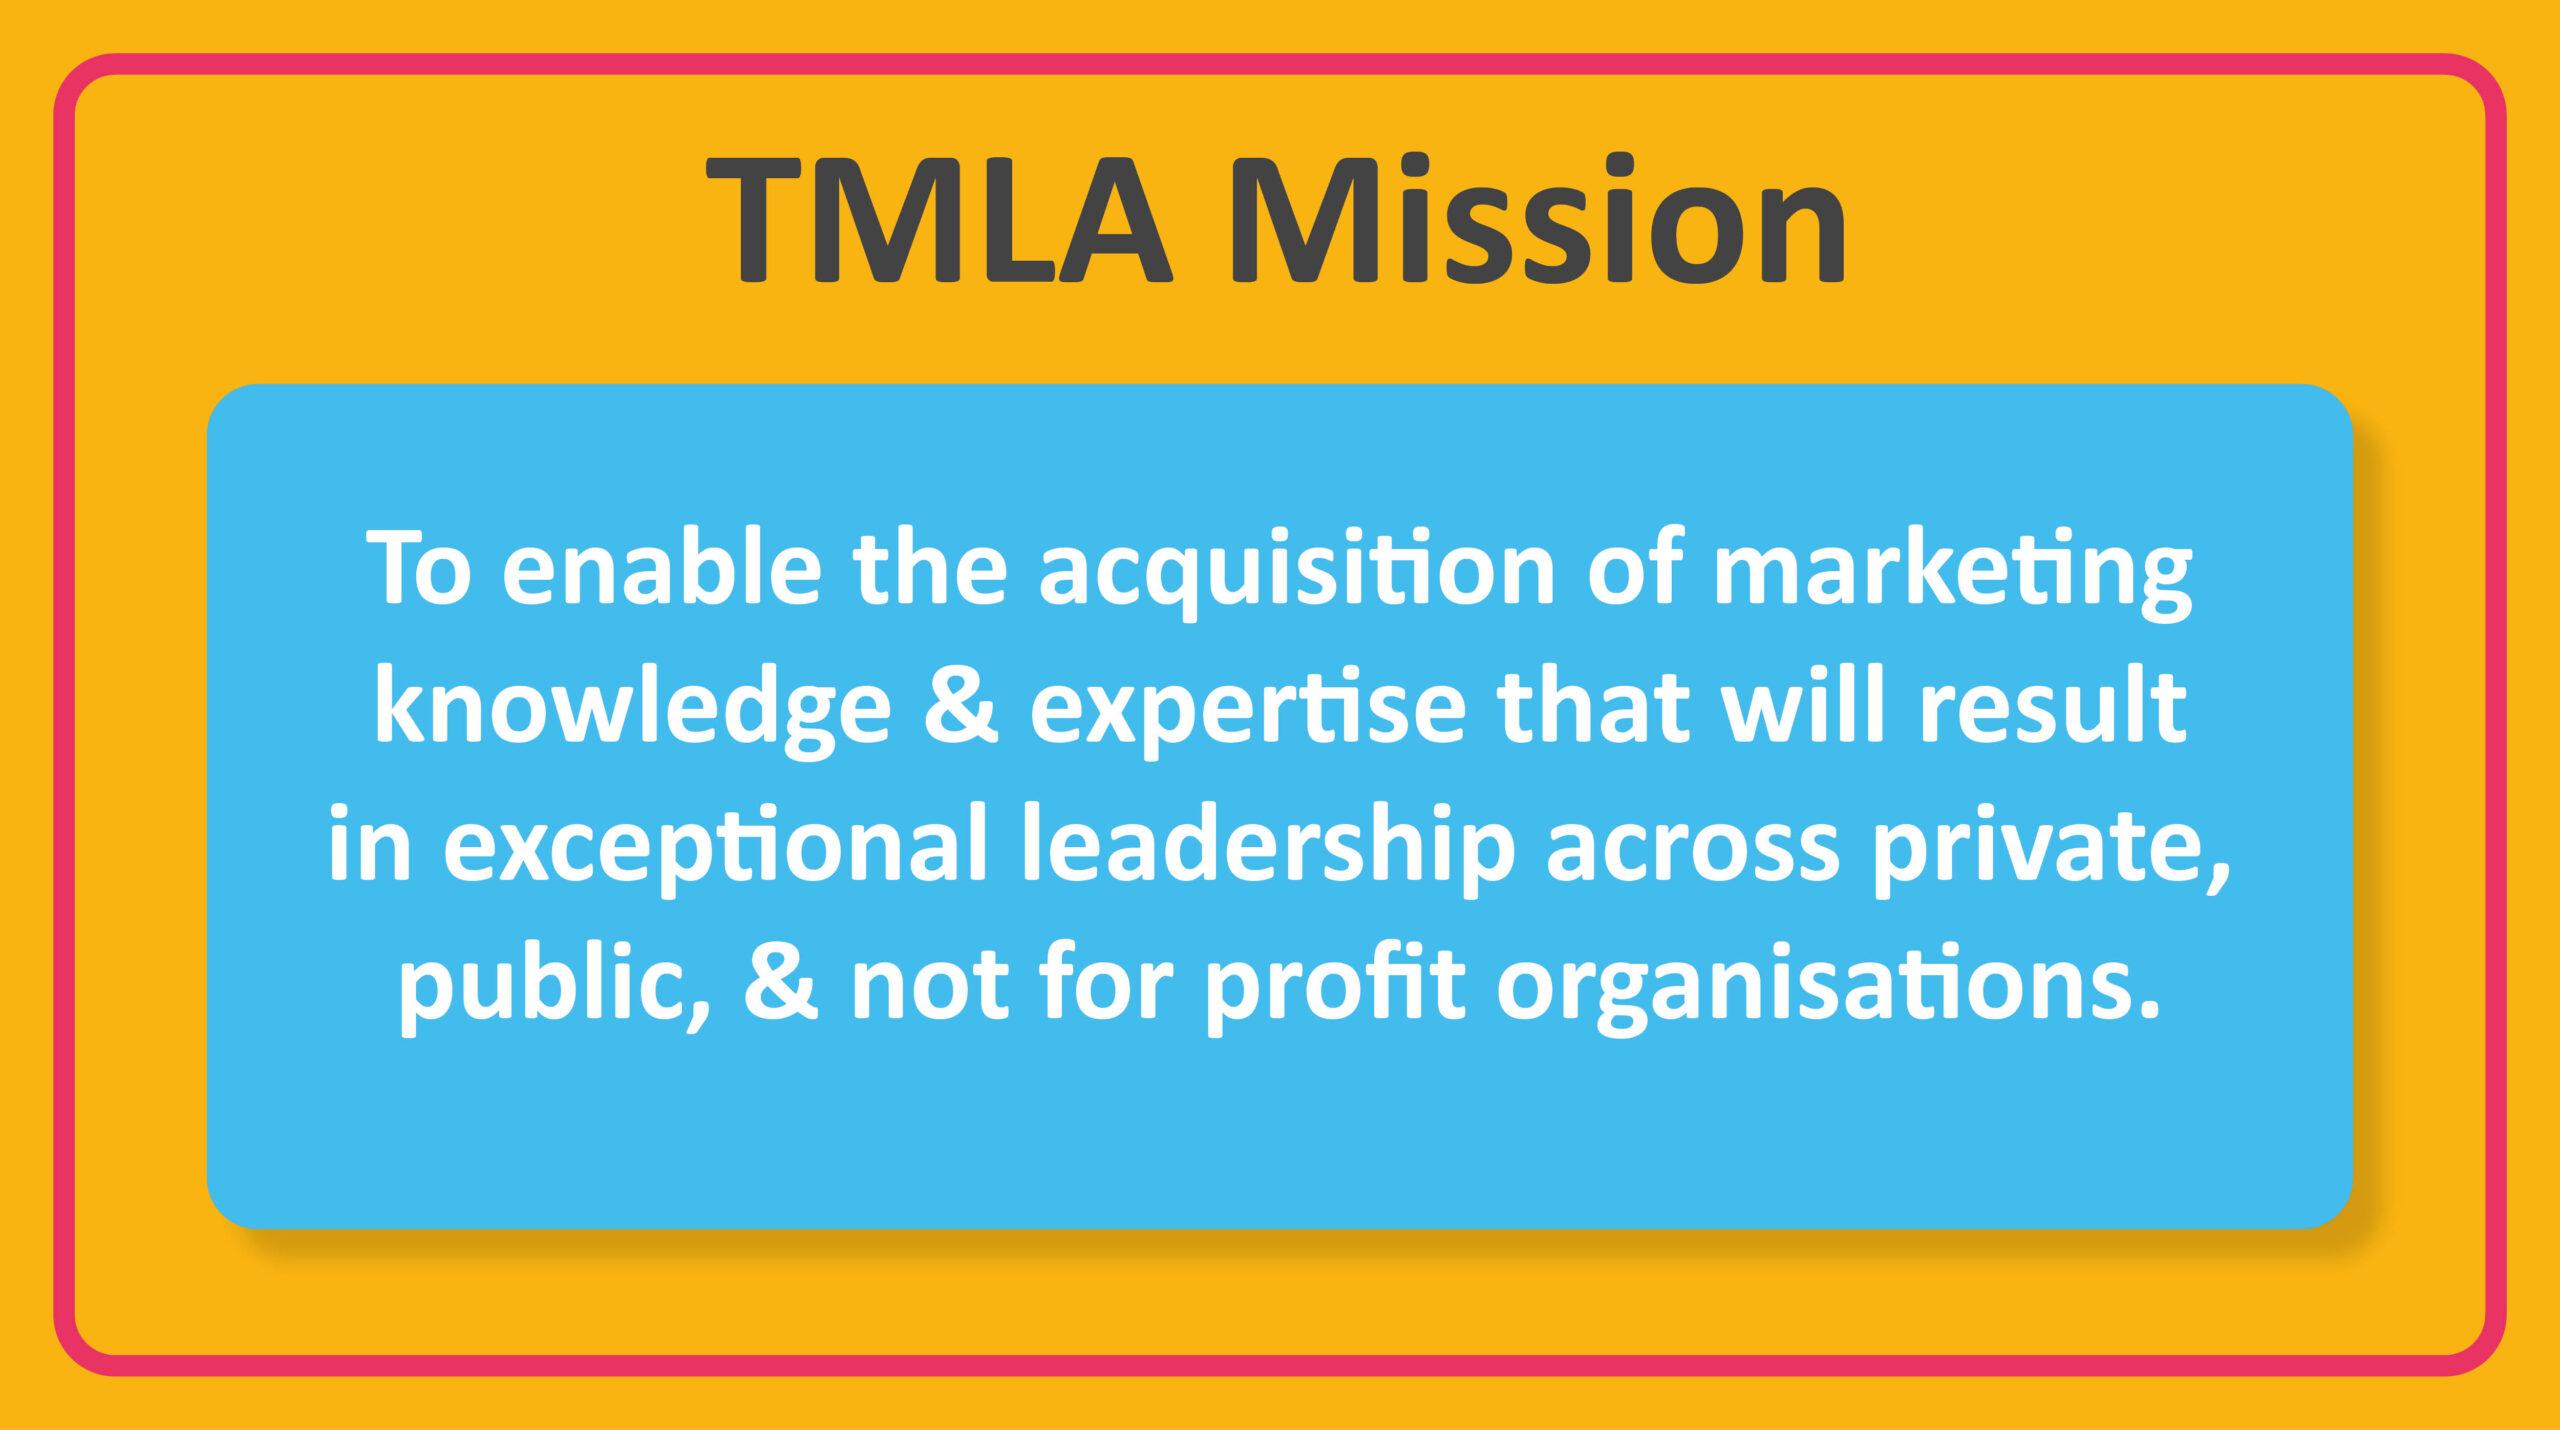 TMLA Mission